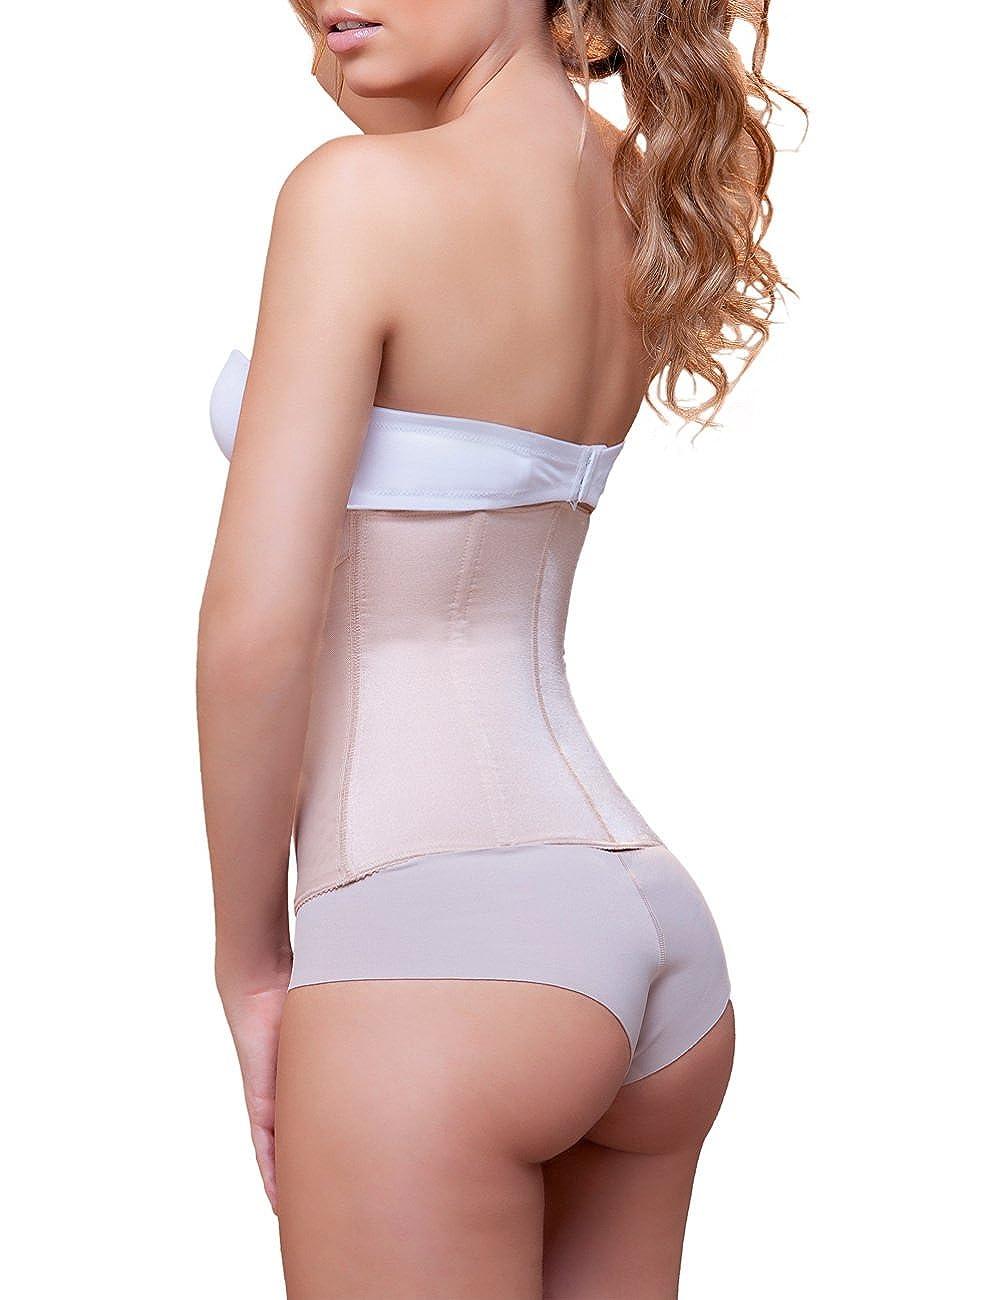 90b4bff25d Vedette 939 Women s Joy Double Layer Waist Cincher w  Zipper at Amazon  Women s Clothing store